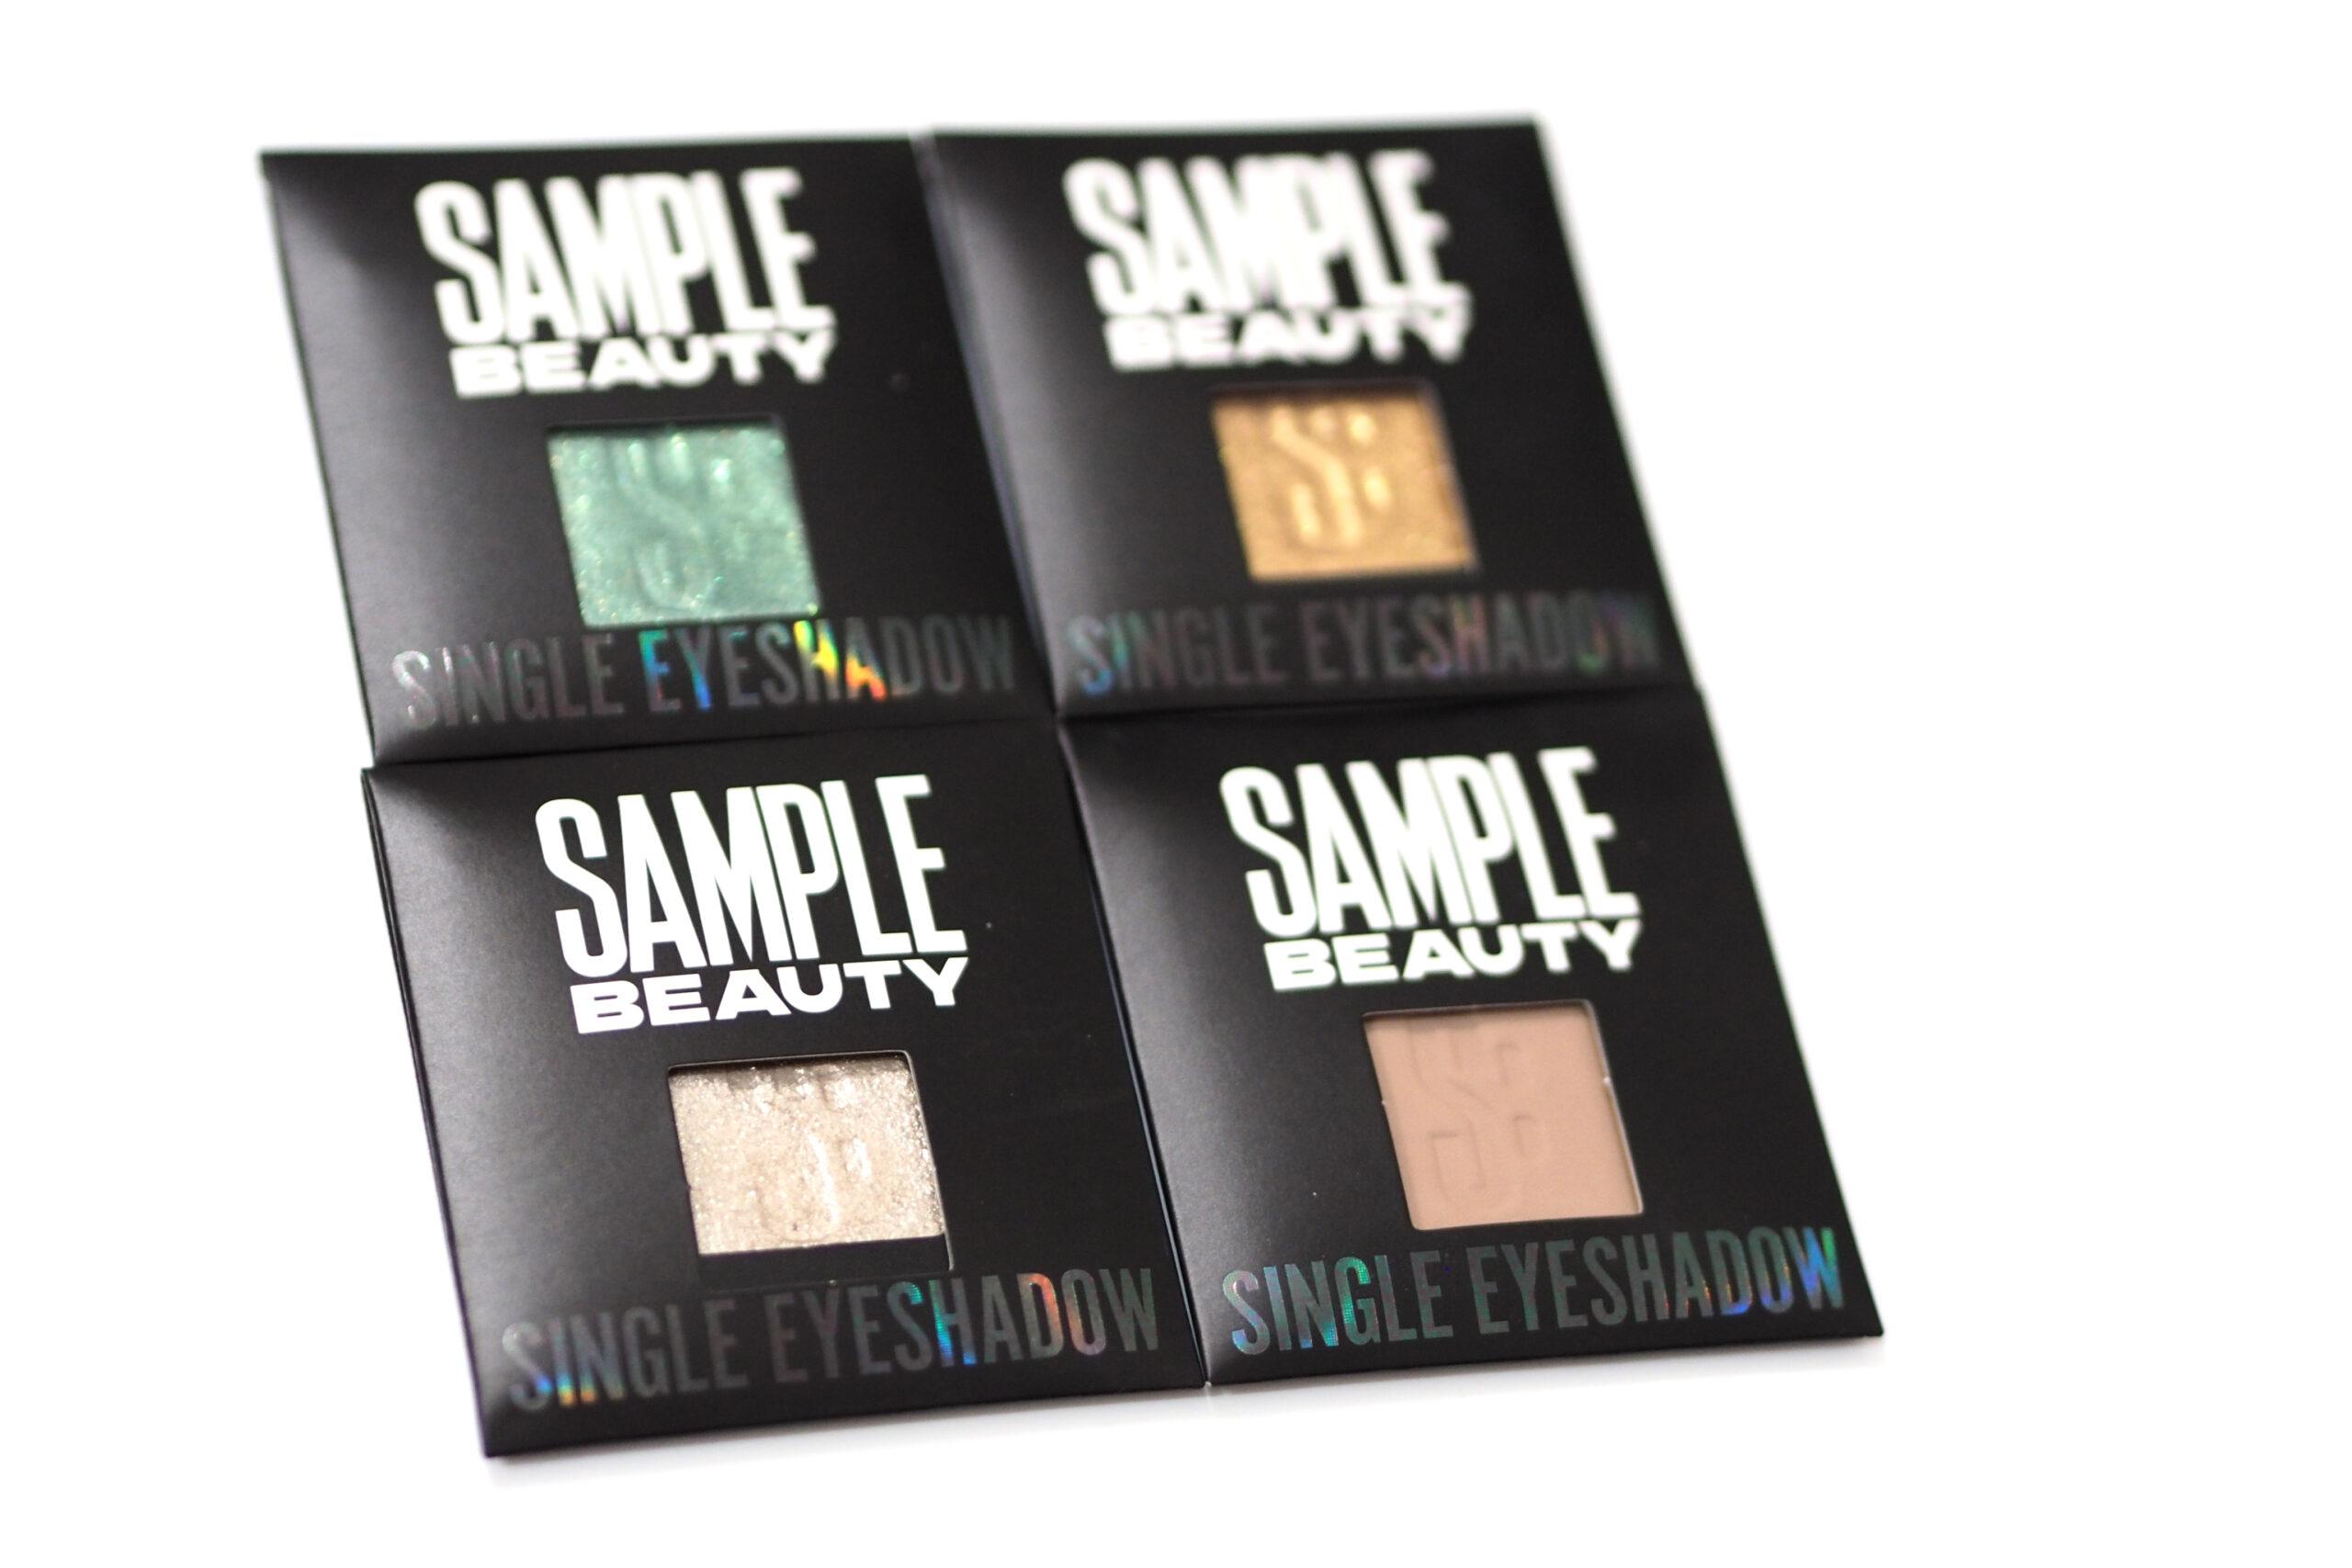 Sample Beauty Single Eyeshadow Collection